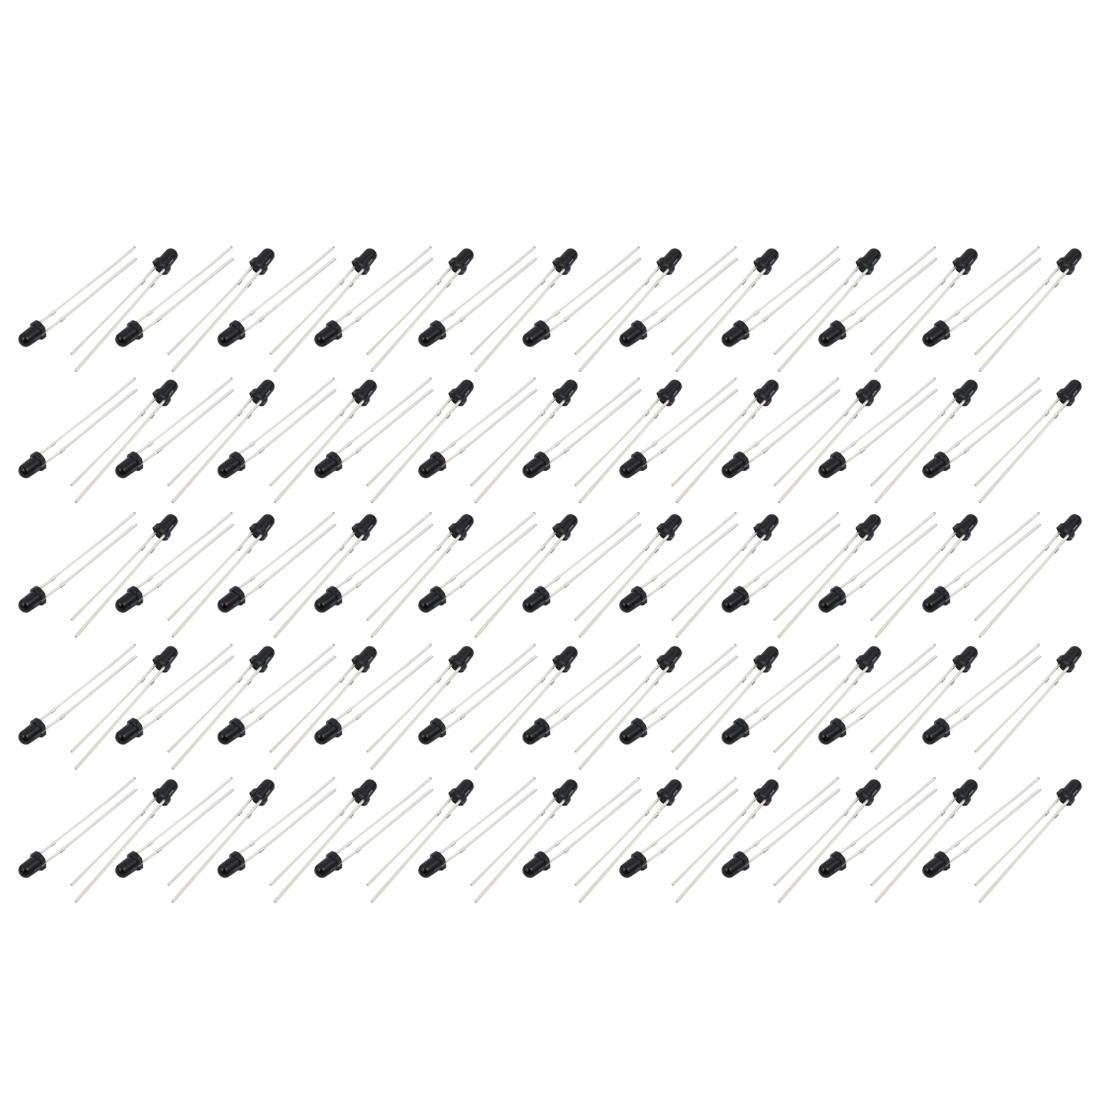 100 Pcs 5V 3mm Round Head Infrared Receiver Photodiodes IR Diode Black